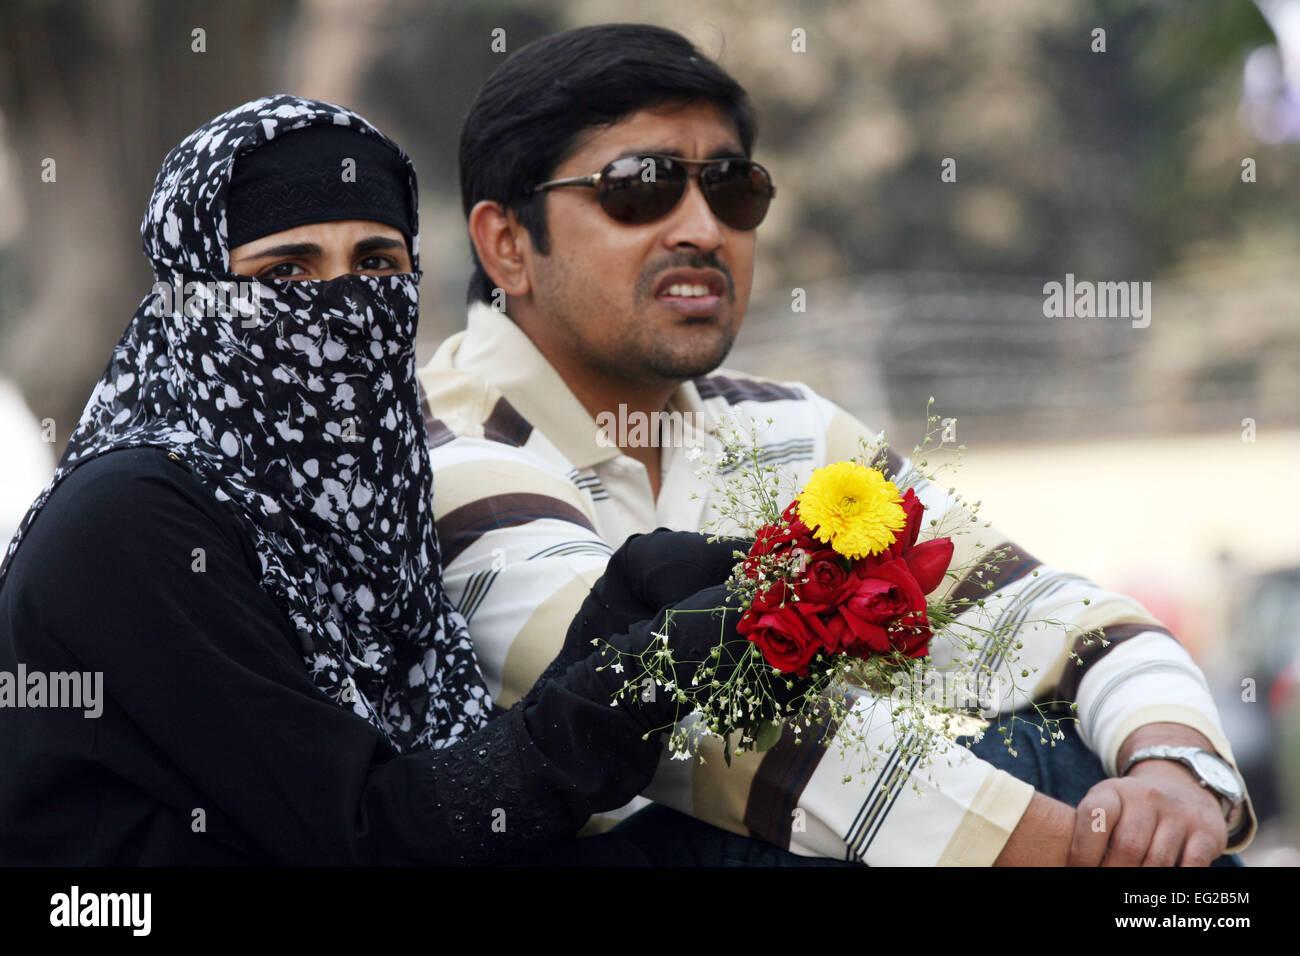 Dhaka bangladesh 14th february 2015 a young couple on valentines day at shohrawardi uddan in dhaka